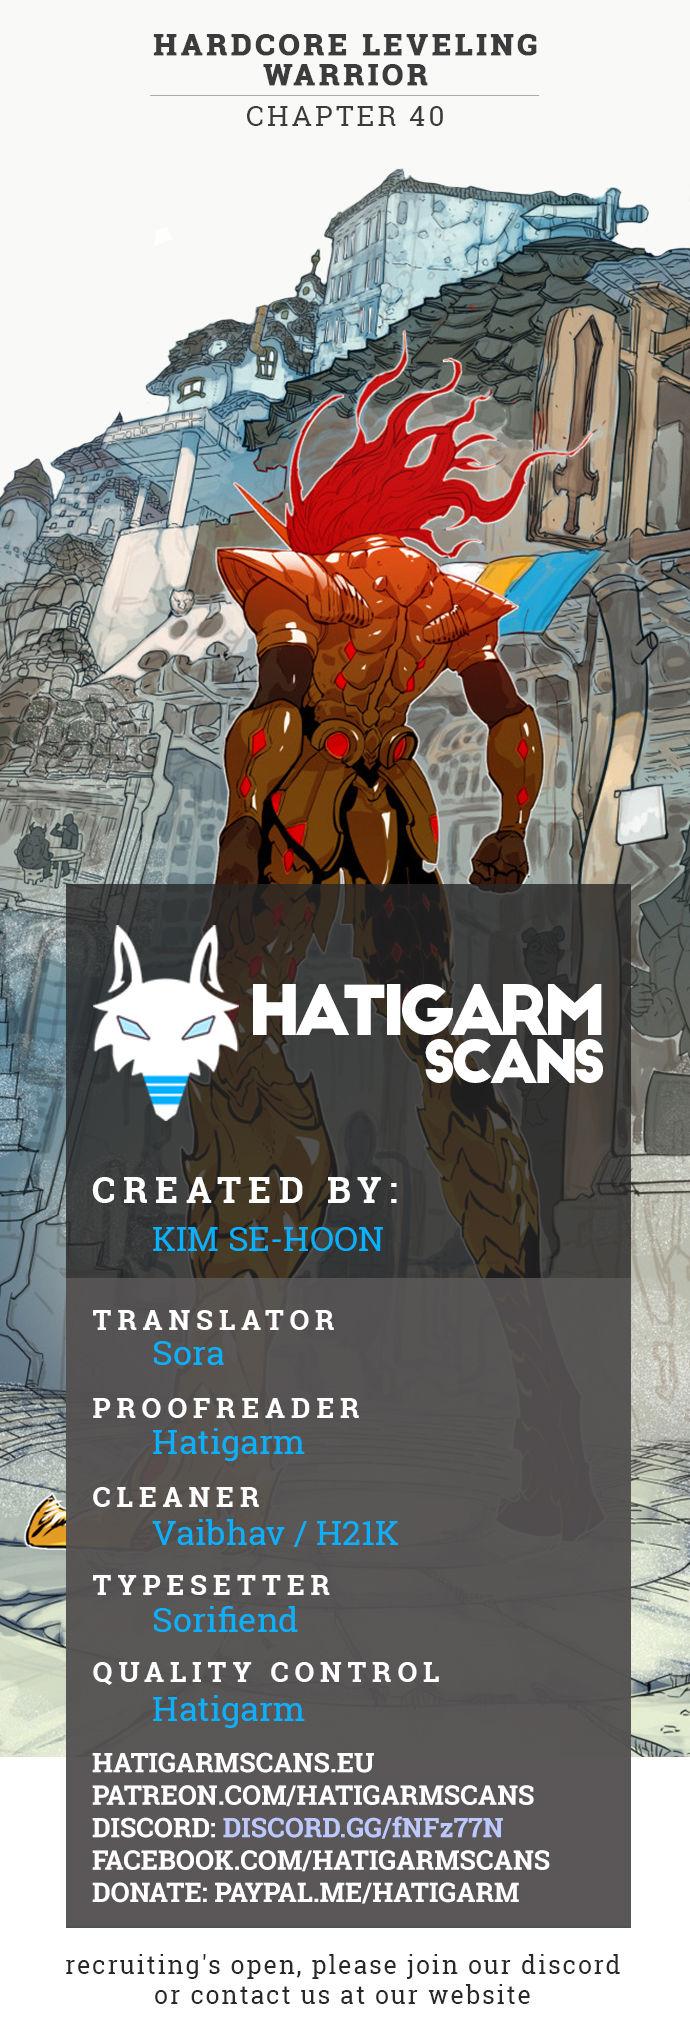 http://img2.nineanime.com/comics/pic9/8/15496/410945/4a643e03578577526149a599ac6f332b.jpg Page 1